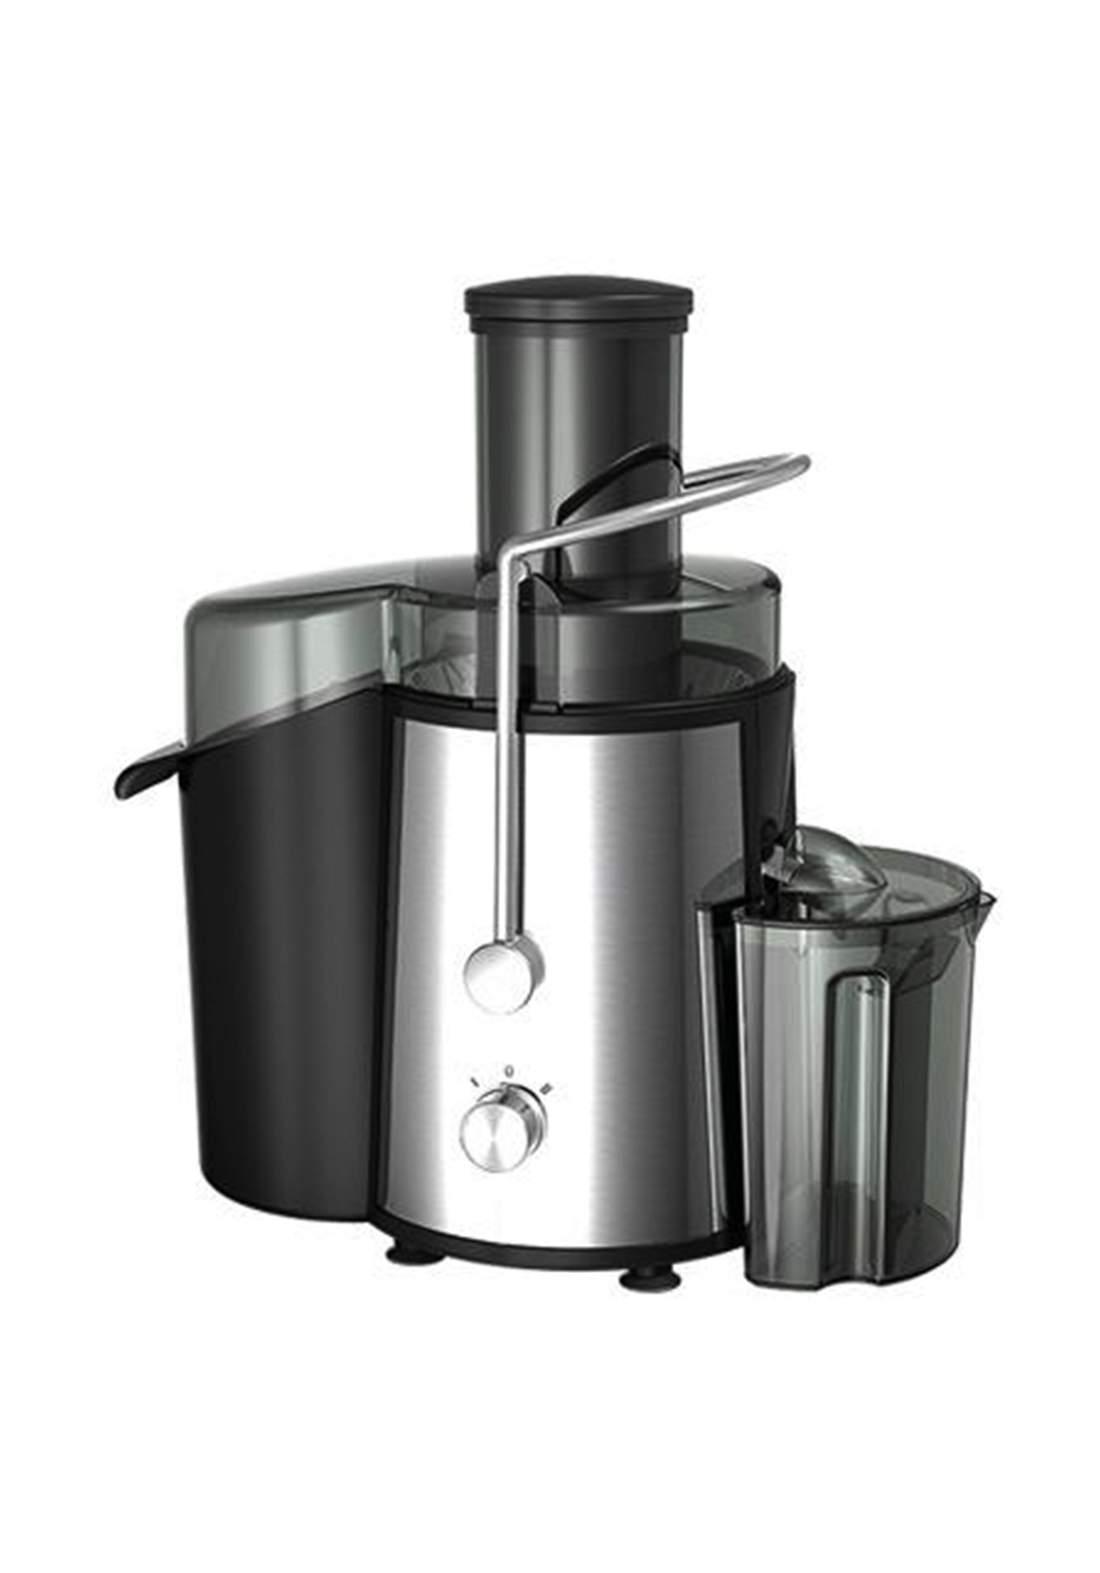 Sayona 4396 Juice Extractor 800w عصارة كهربائية